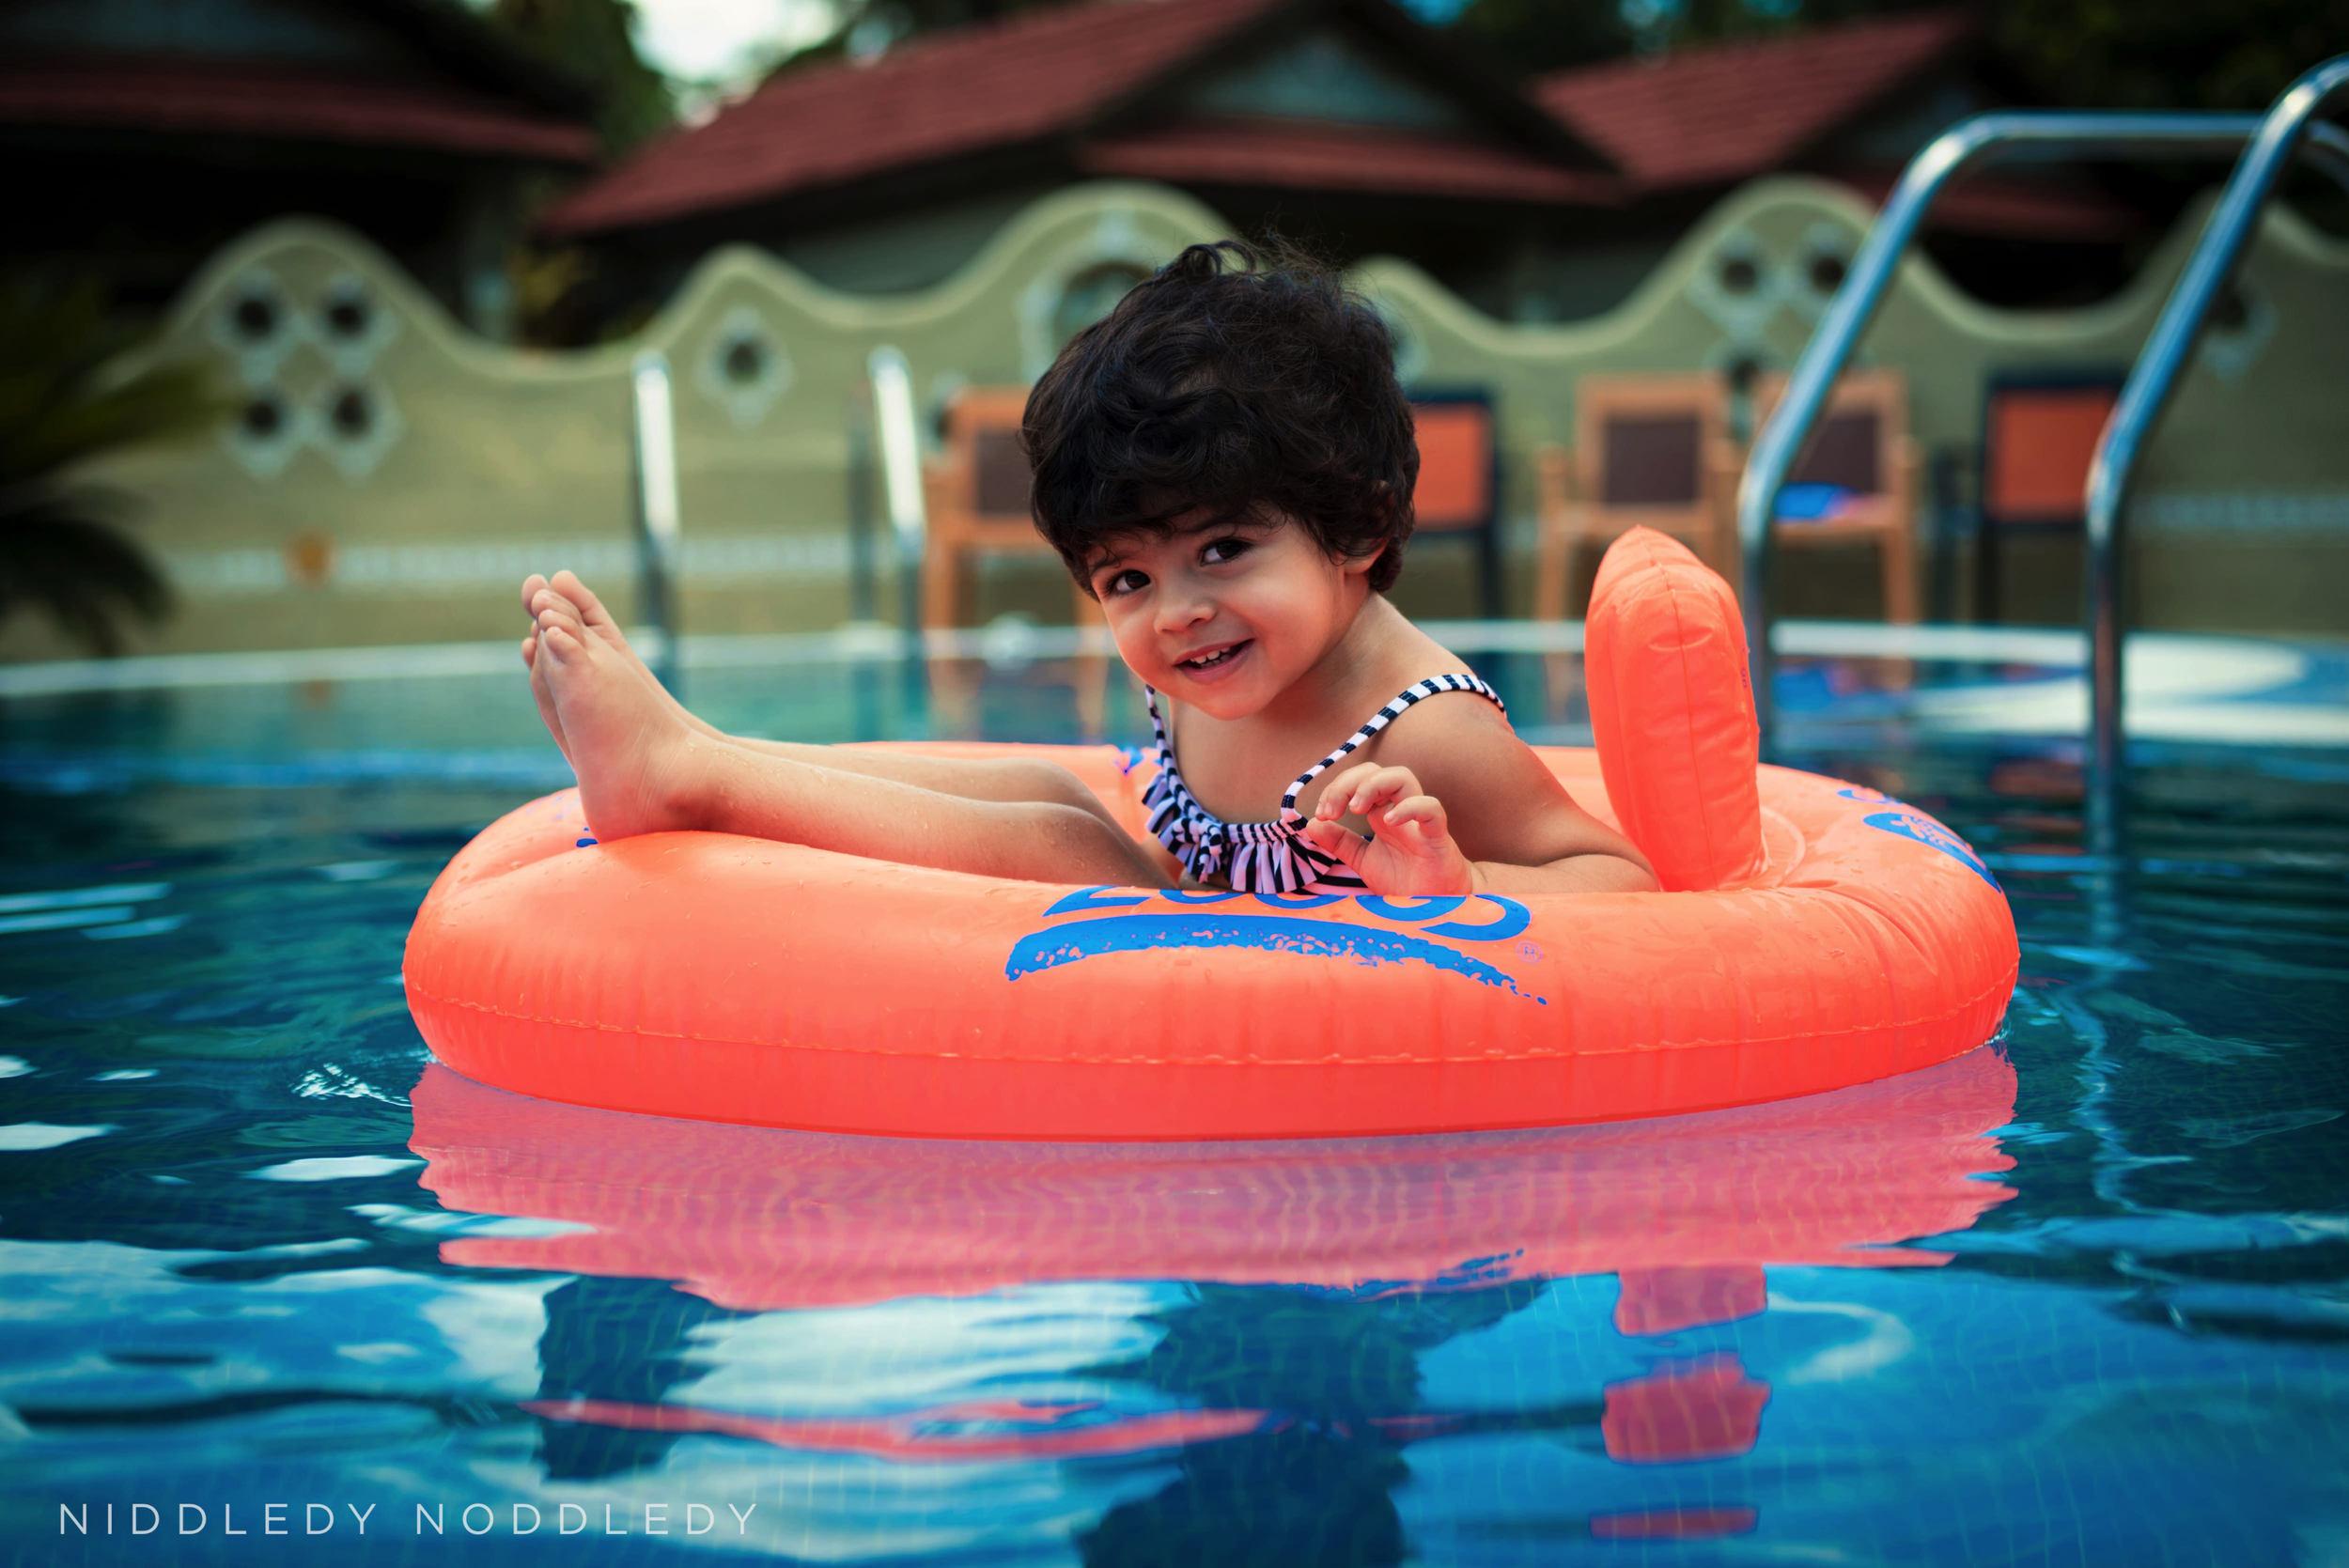 Best Photographer ❤ NiddledyNoddledy.com ~ Prenatal, Newborn and Child Photography, Calcutta - 14.jpg